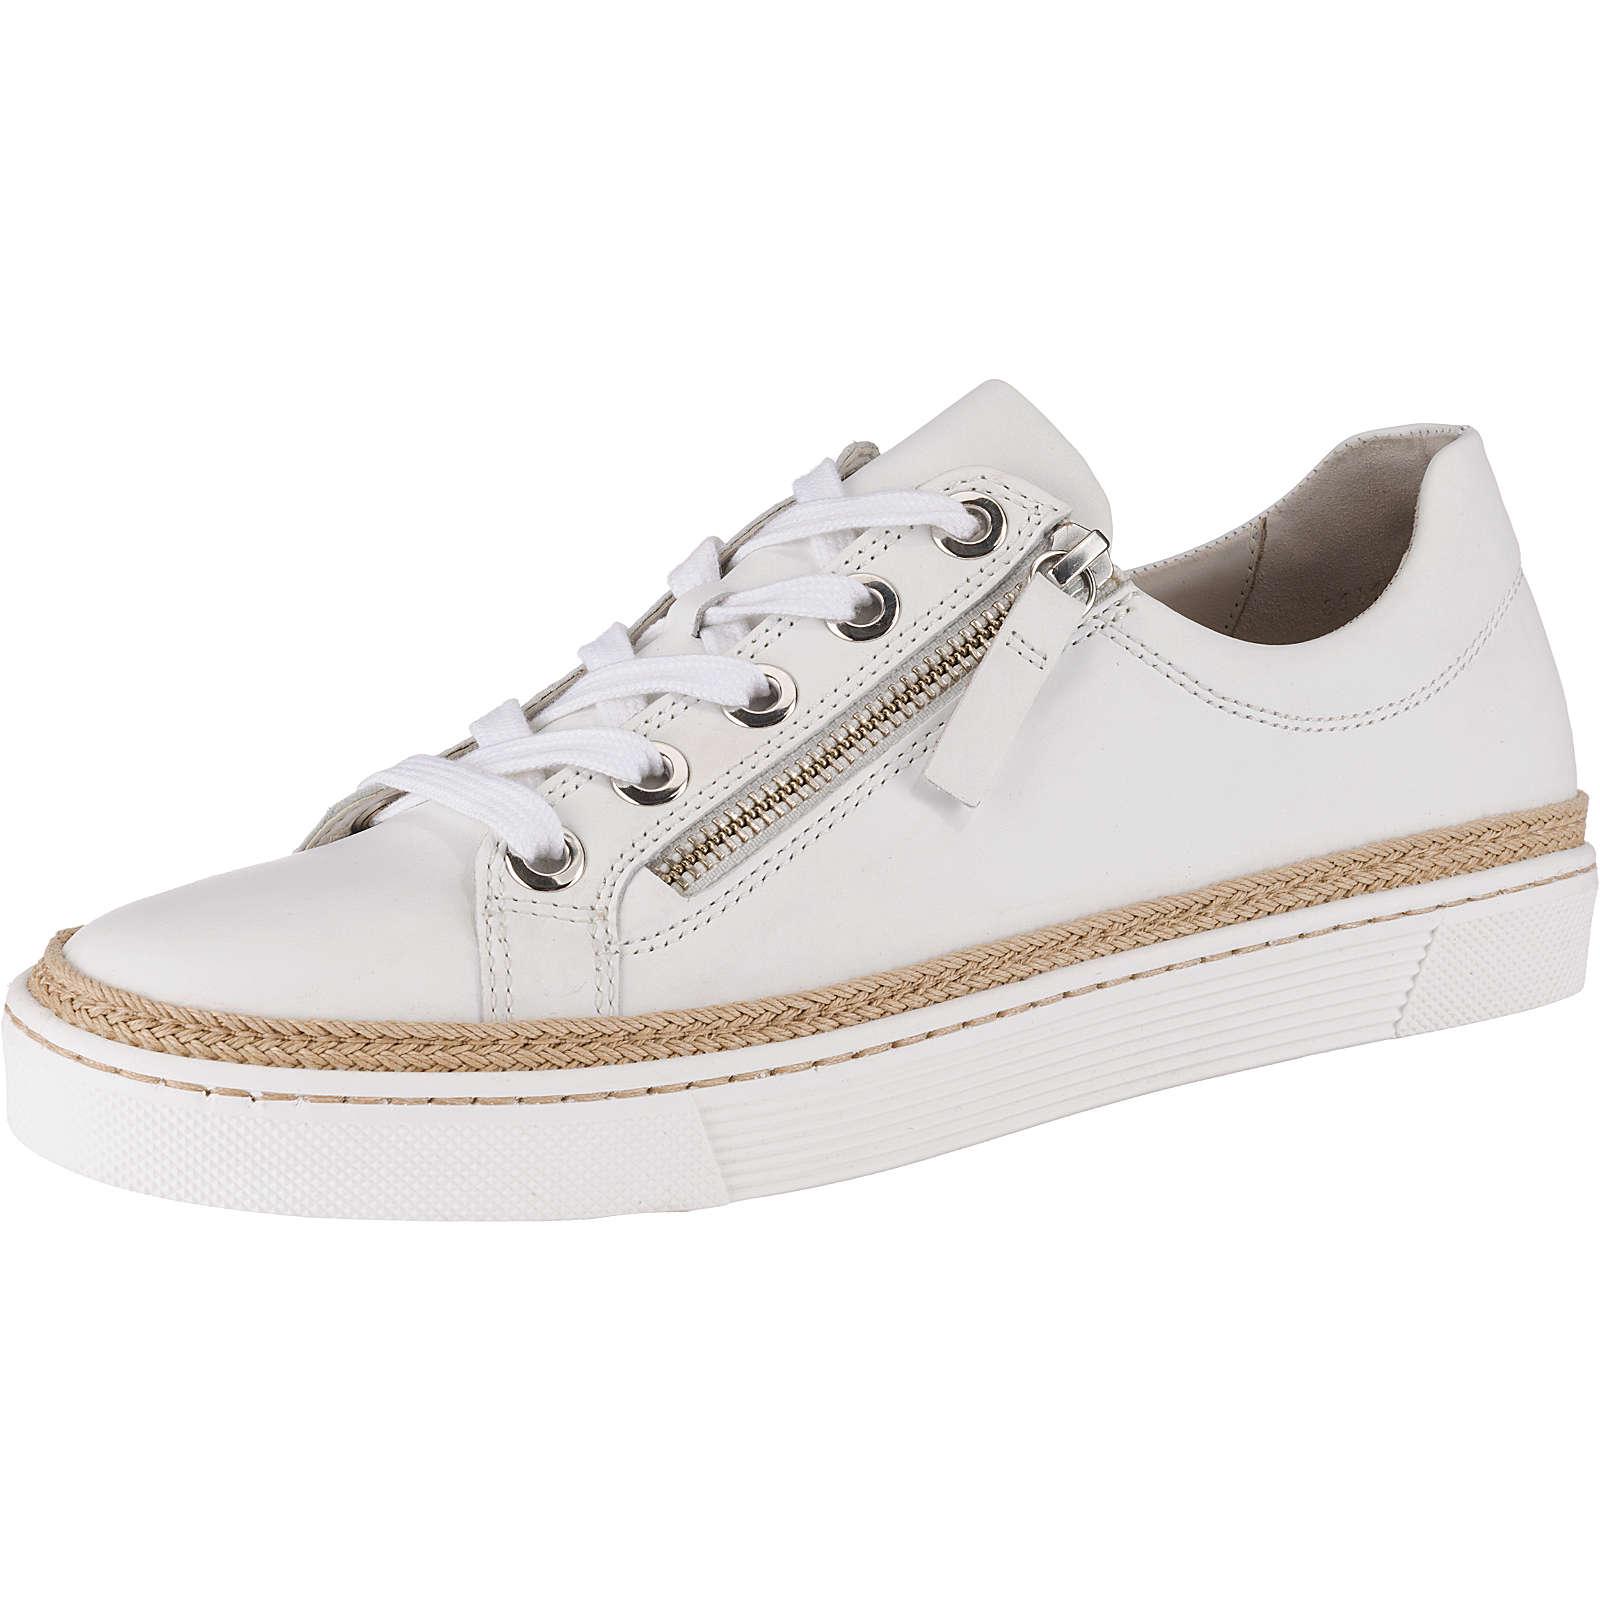 Gabor Sneakers Low weiß Damen Gr. 39